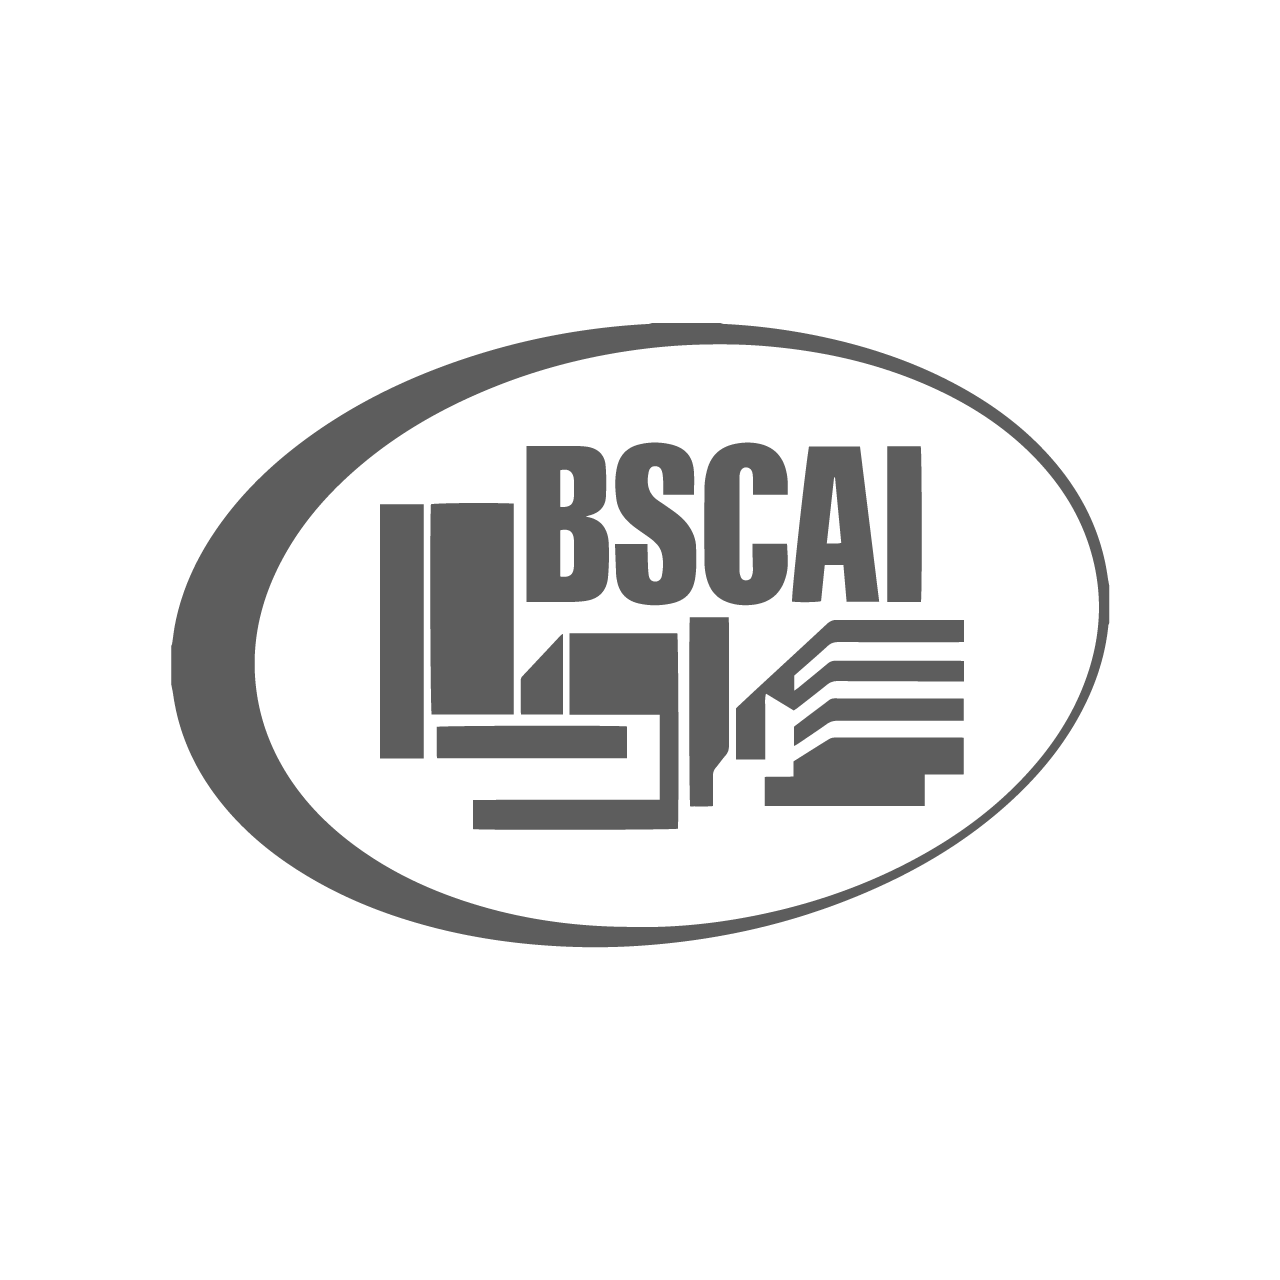 the BSCAI logo